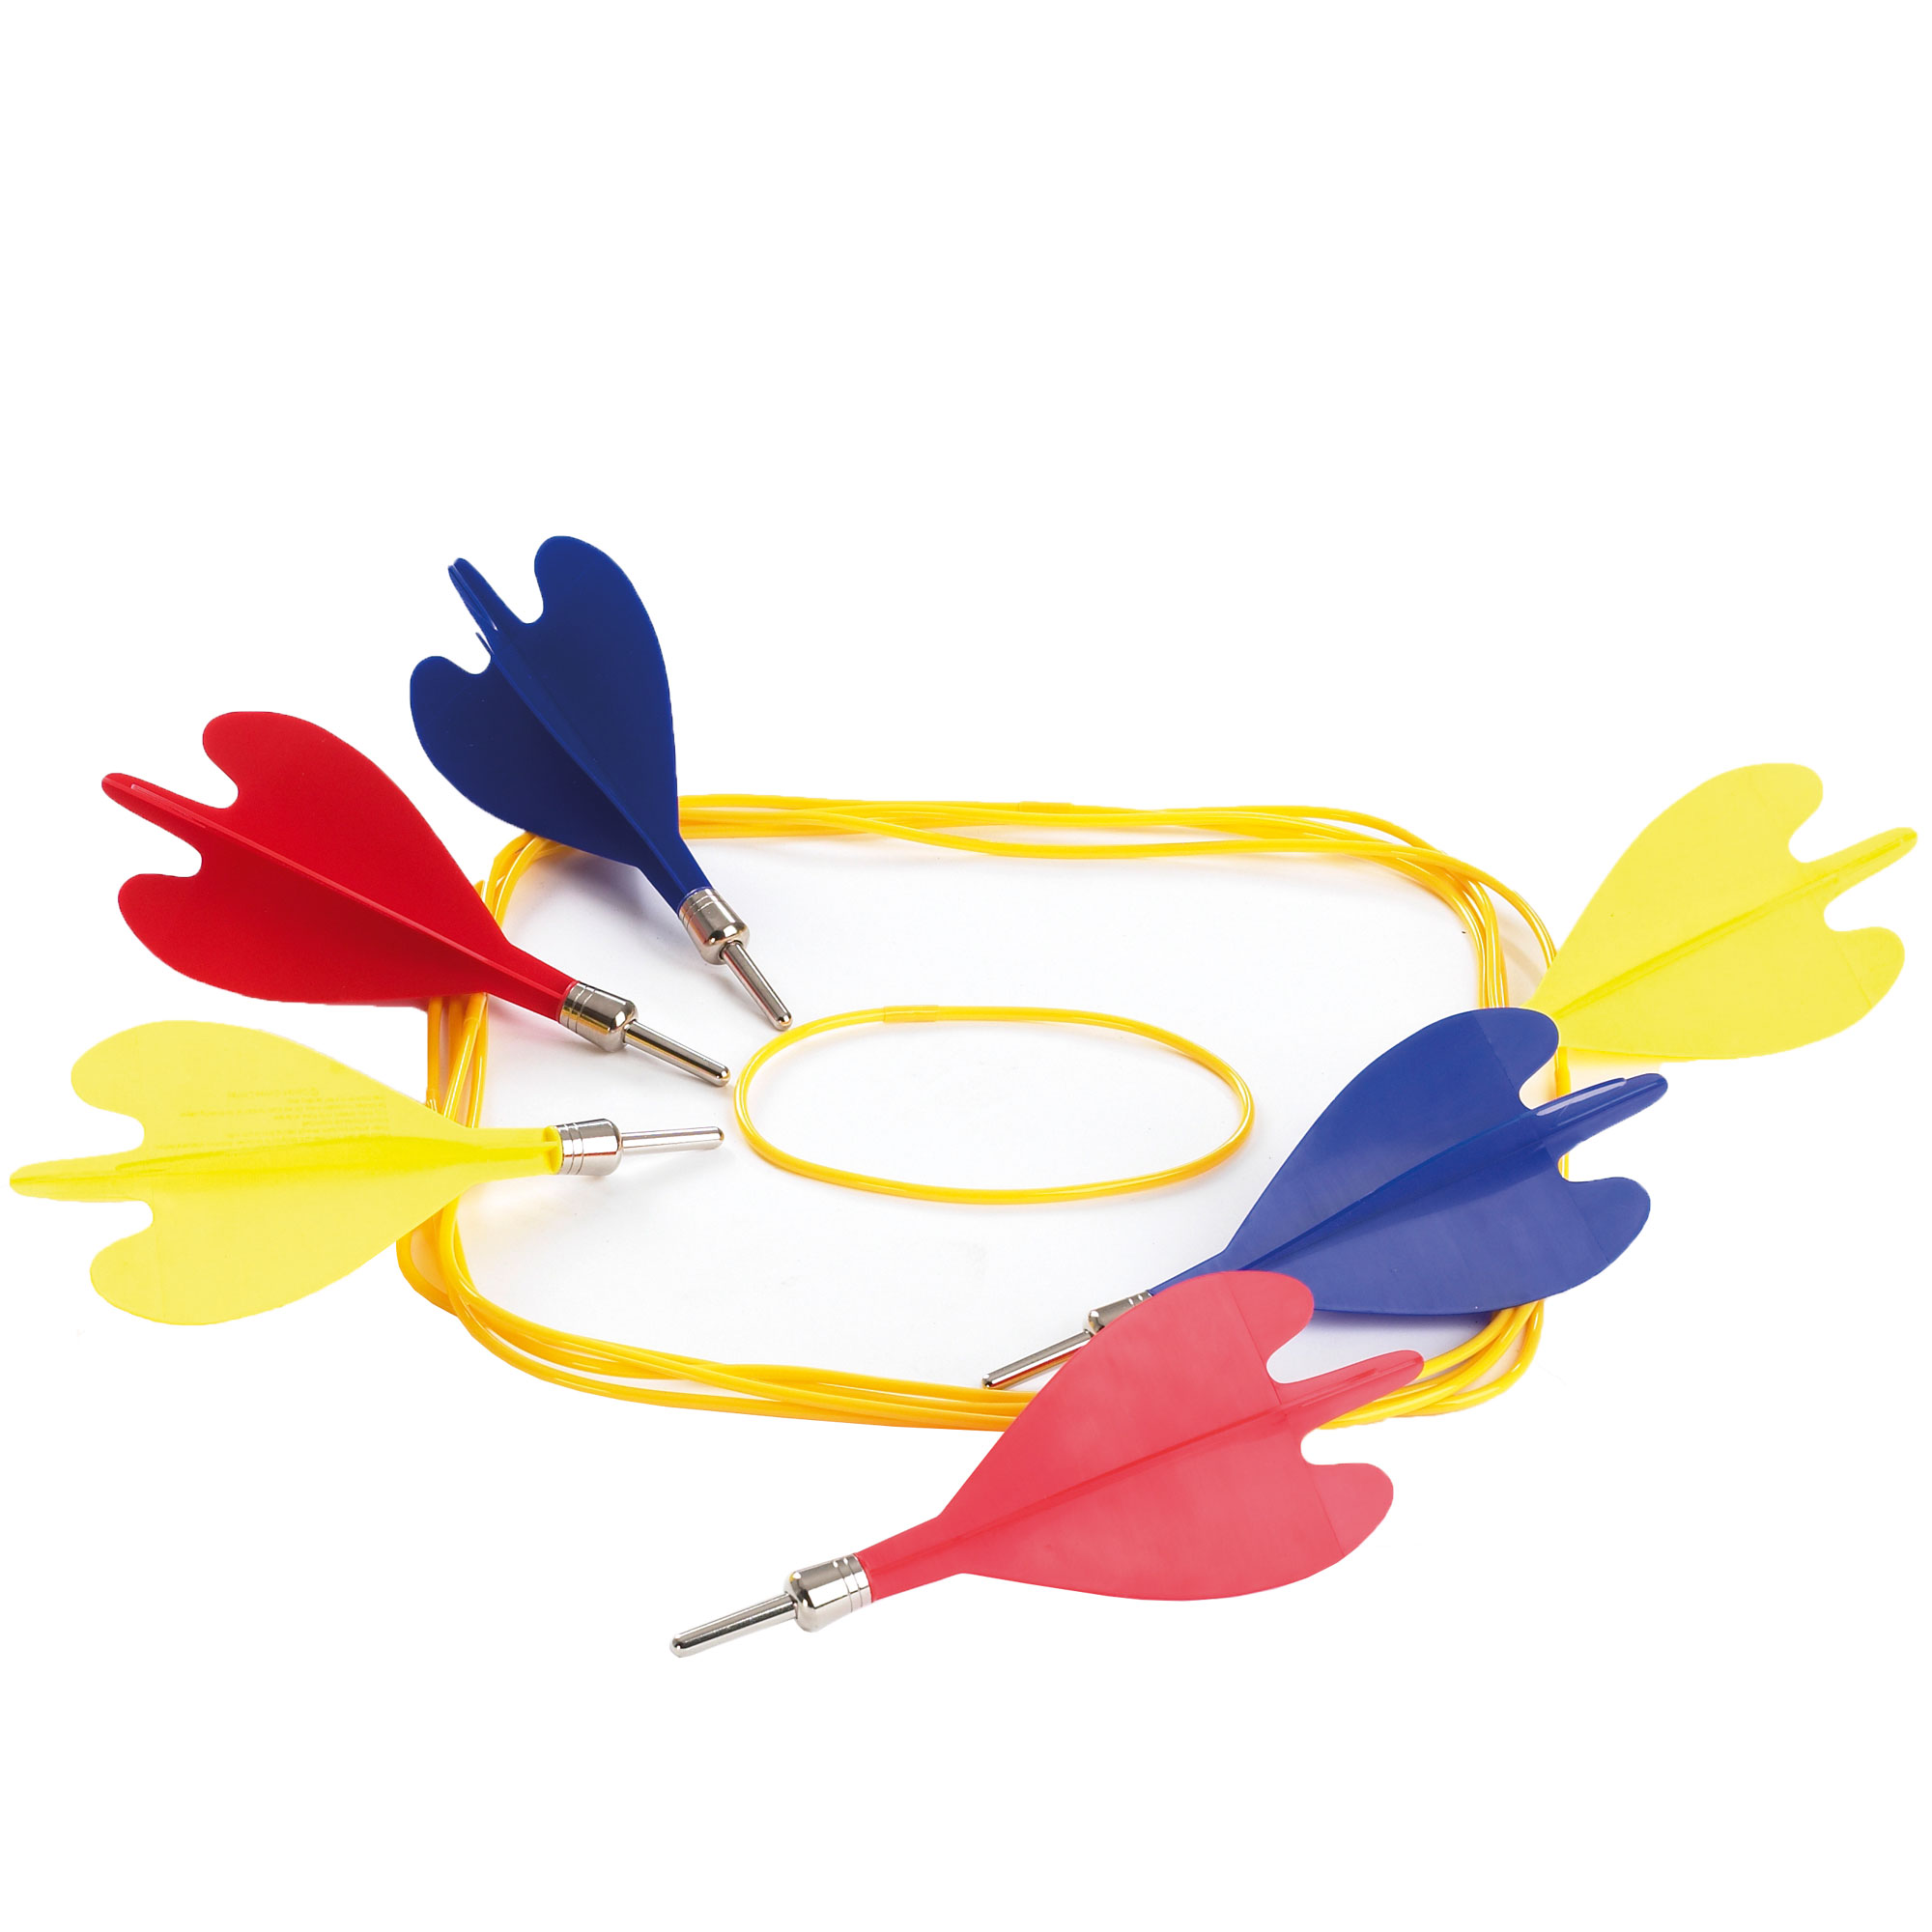 Image of Garden Darts